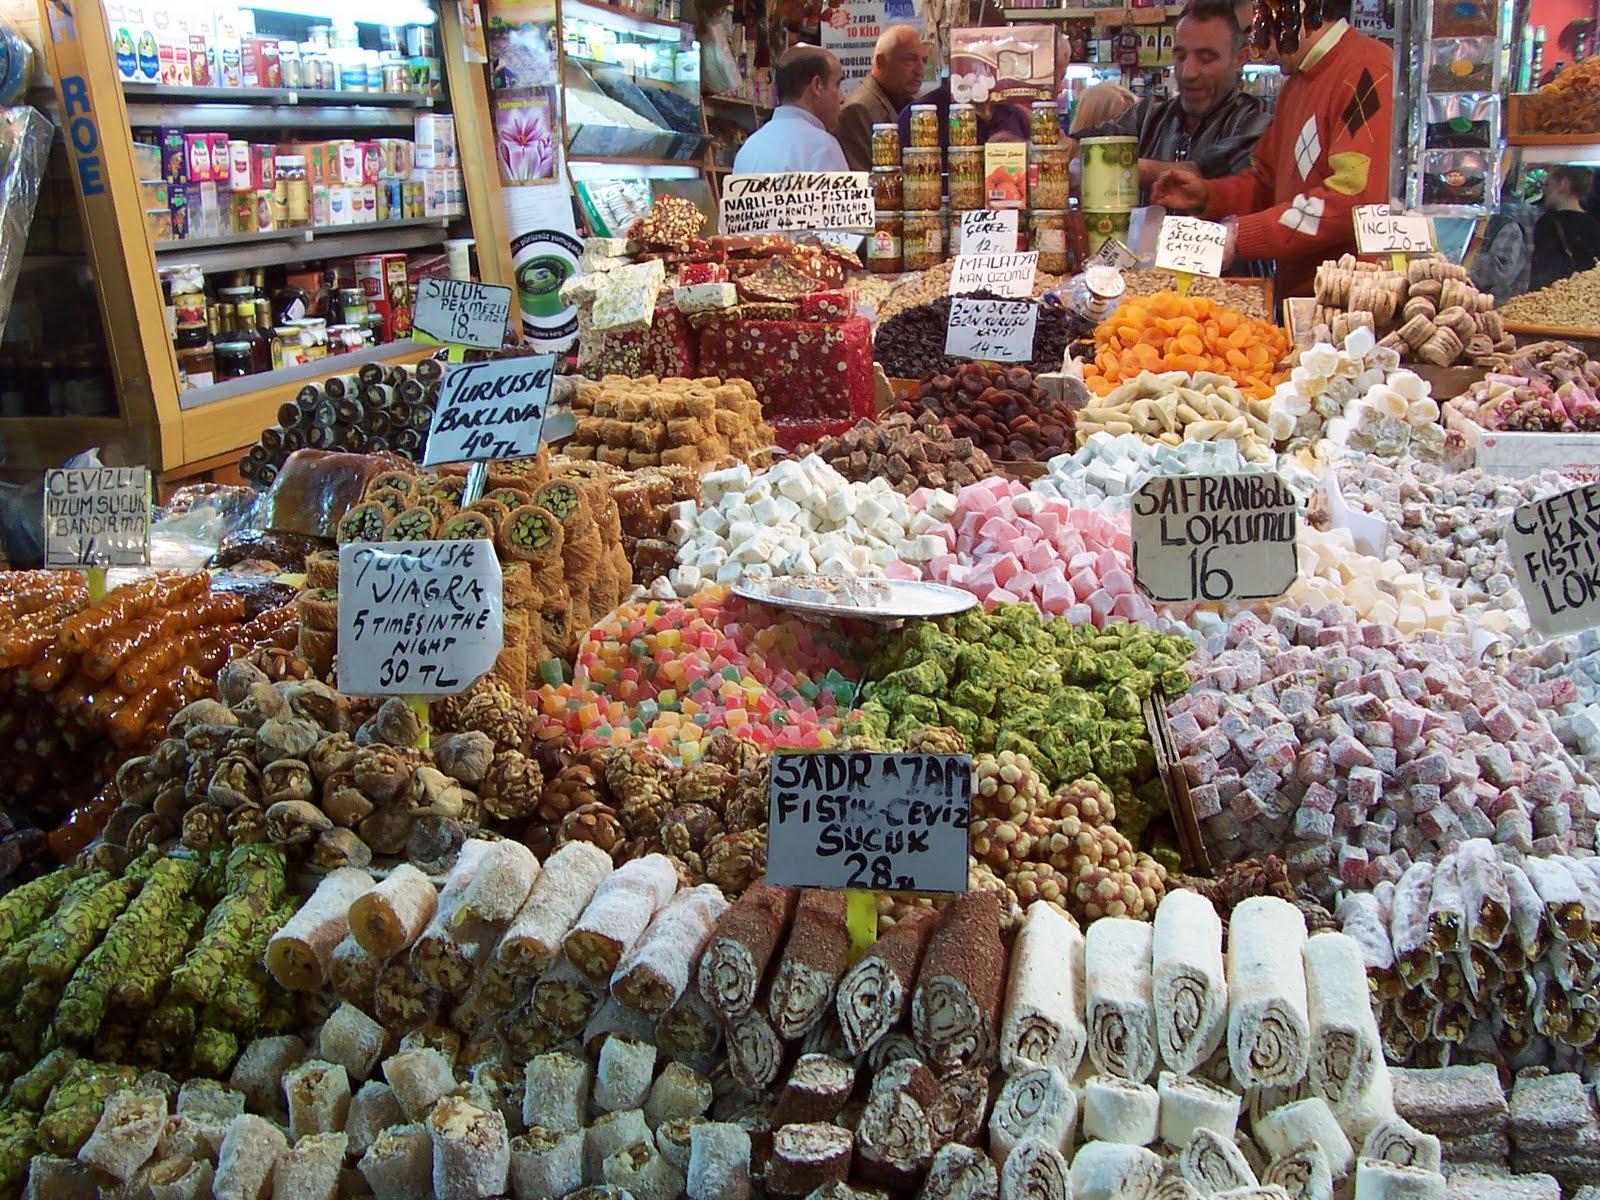 Sweetest Sights, Lokum Shop, Istanbul, Turkey, Merchandise ...